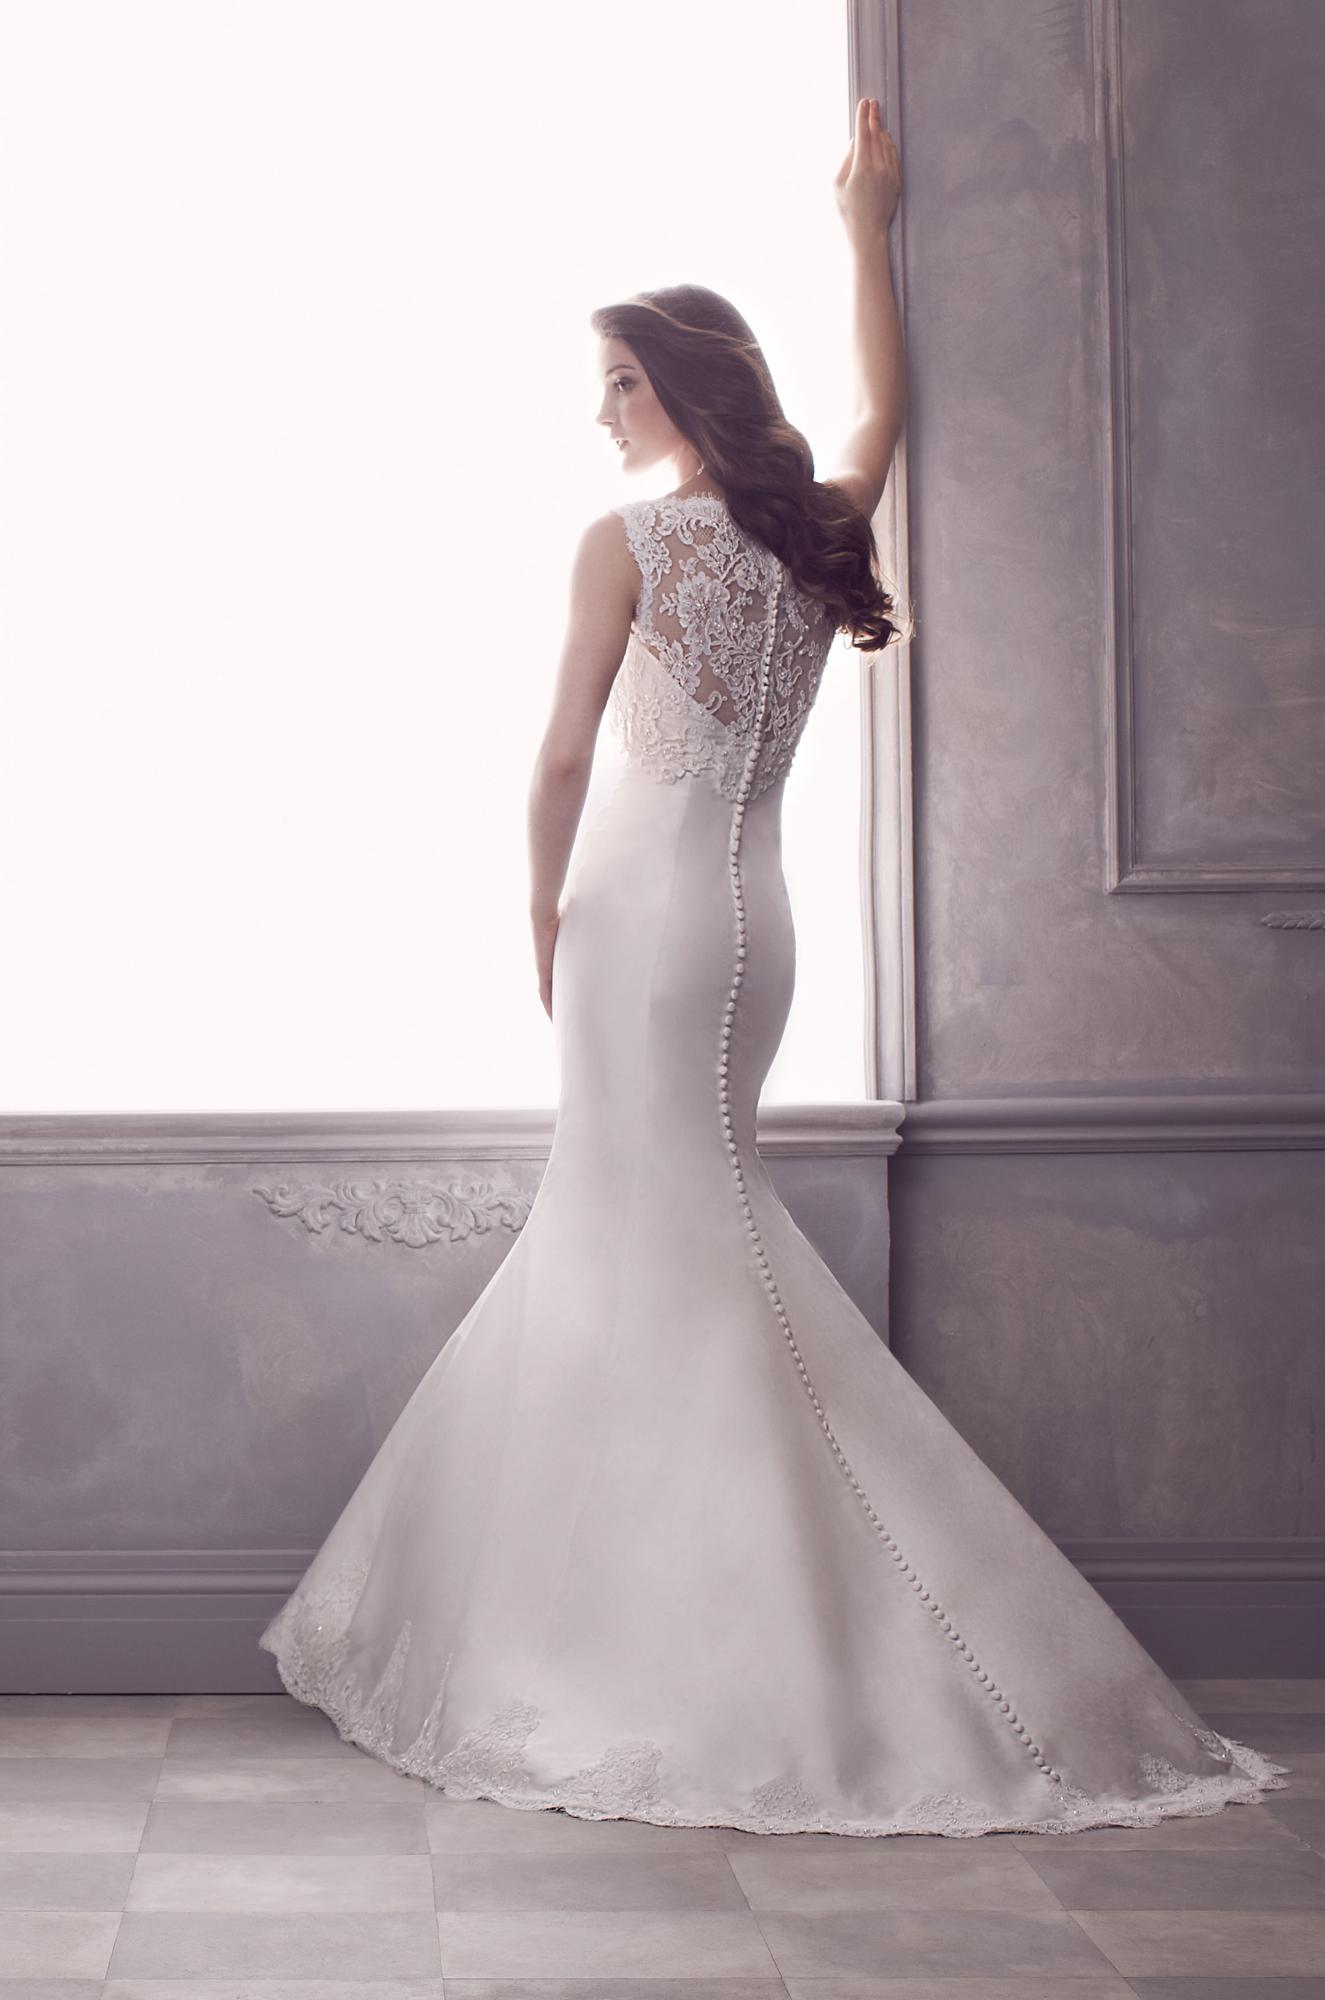 French alençon lace and silk dupioni wedding dress back view beaded